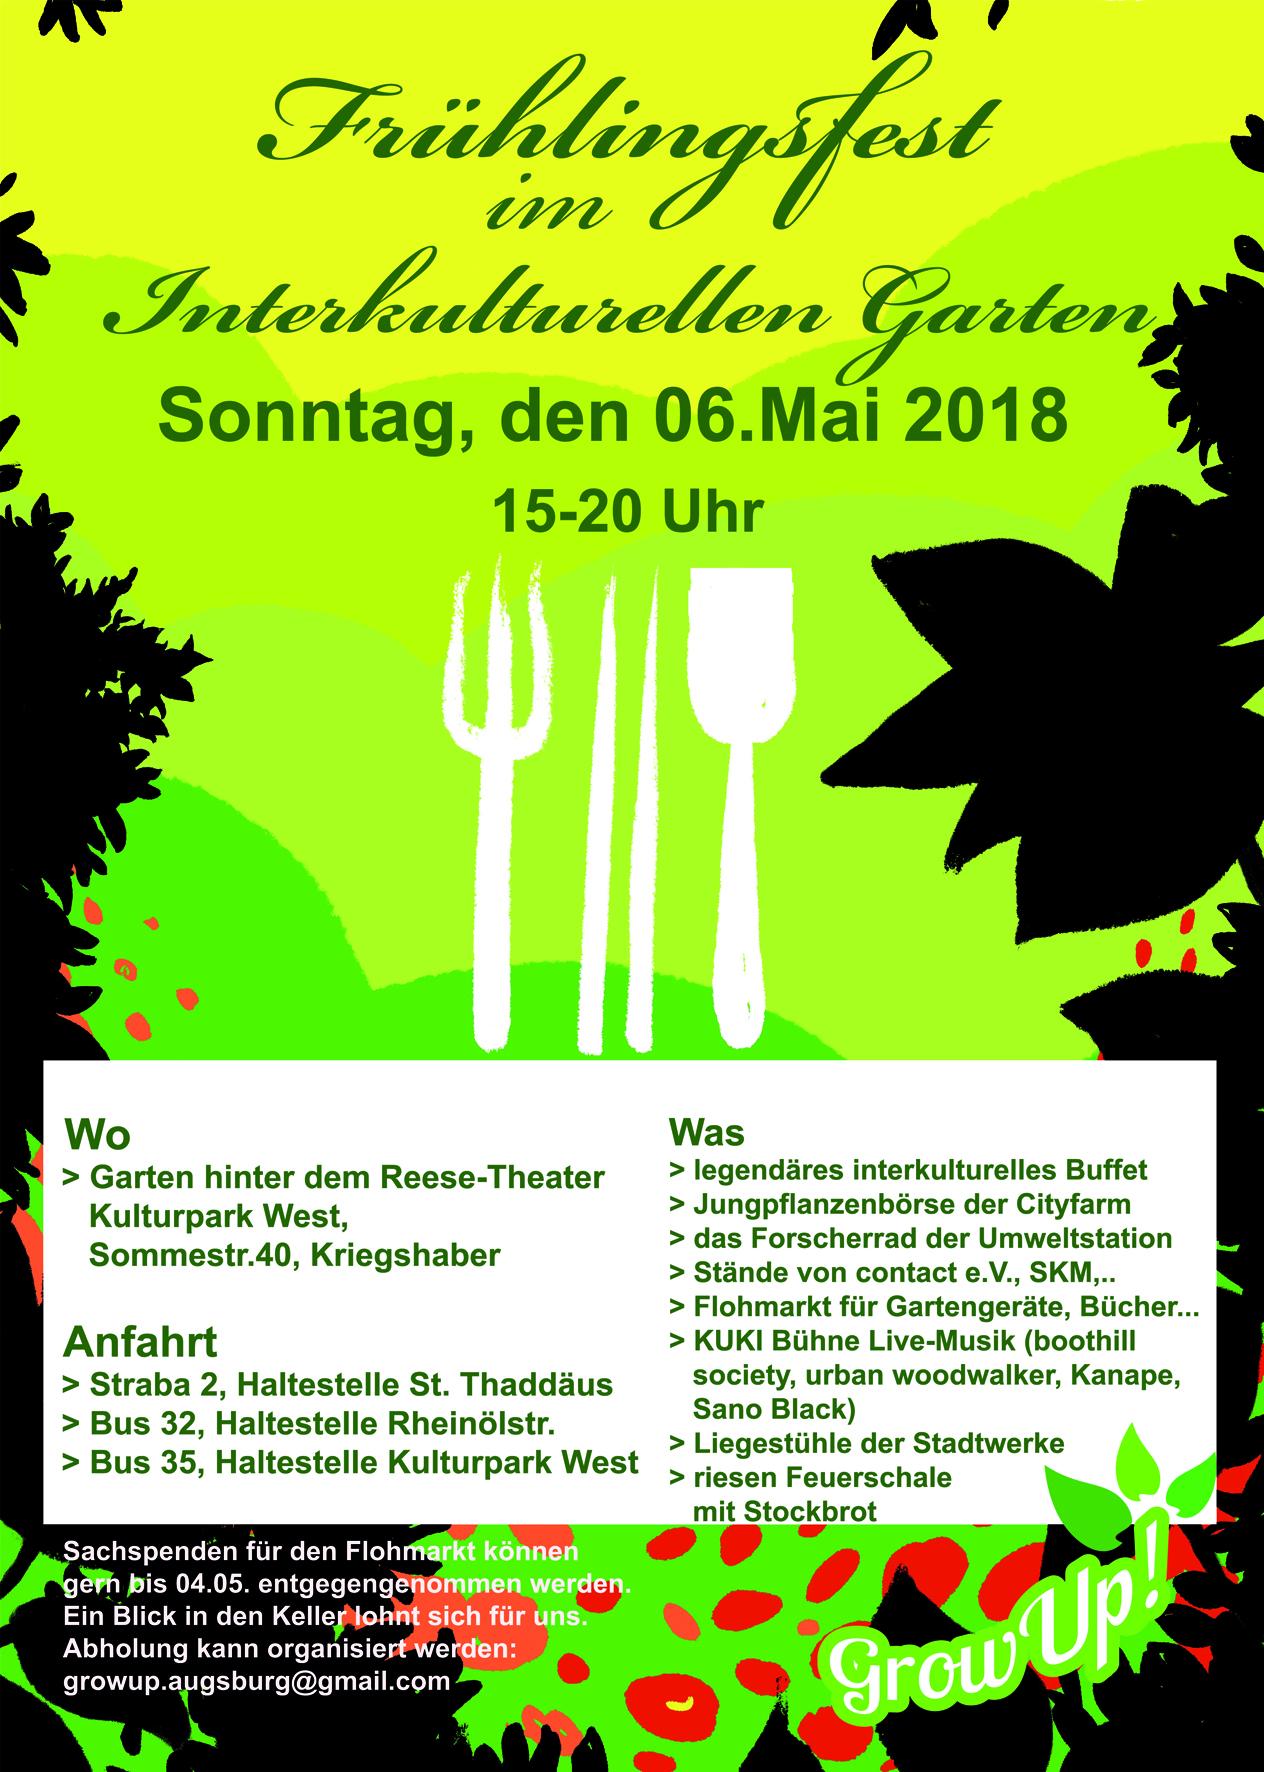 Frühlingsfest 2018 grow up Interkultureller Garten Augsburg e.V.